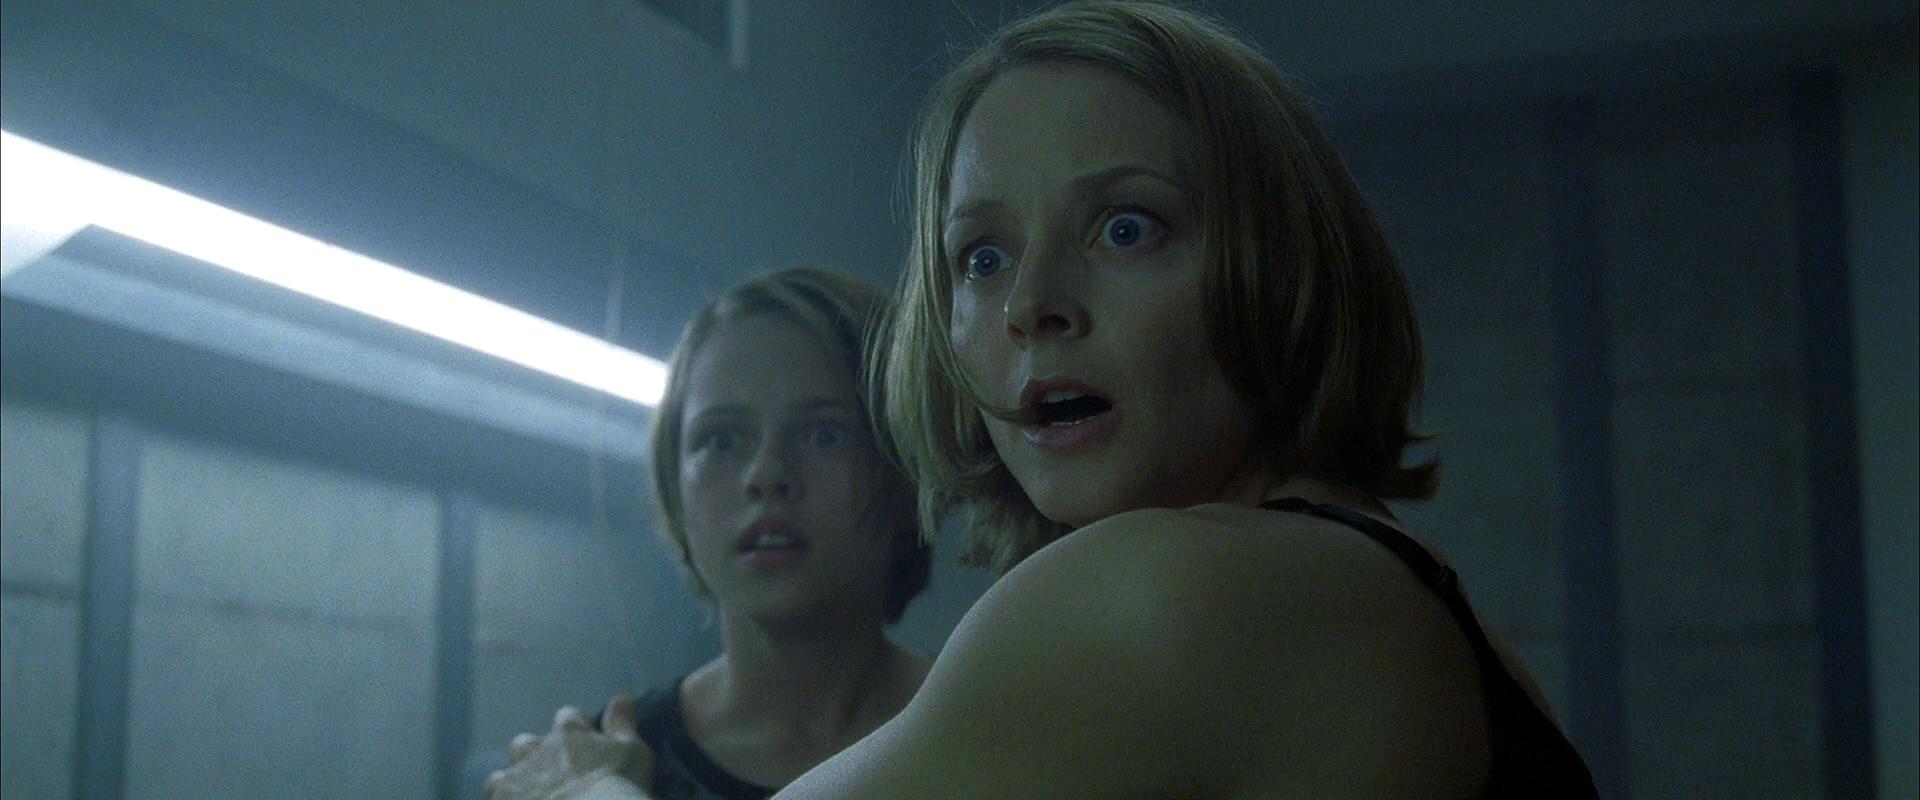 Davidkoepp Com Panic Room Script Archives The Fincher Analyst